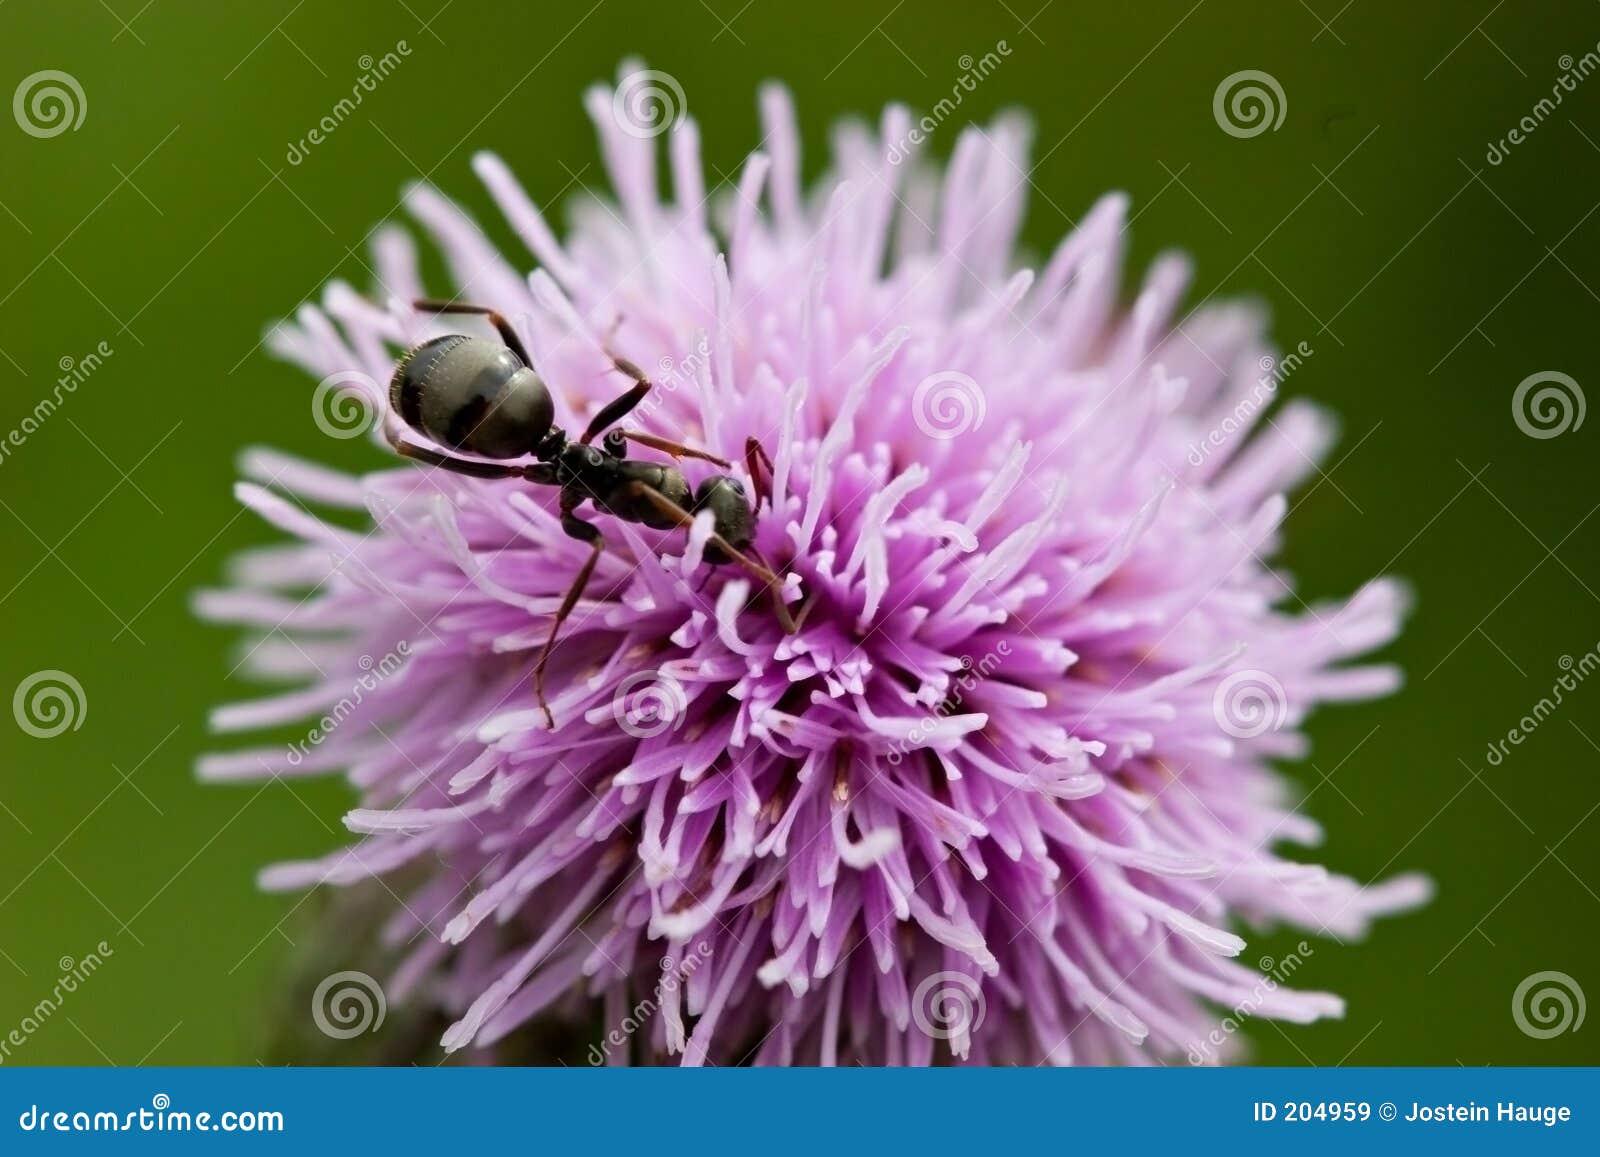 Formica sul cardo selvatico